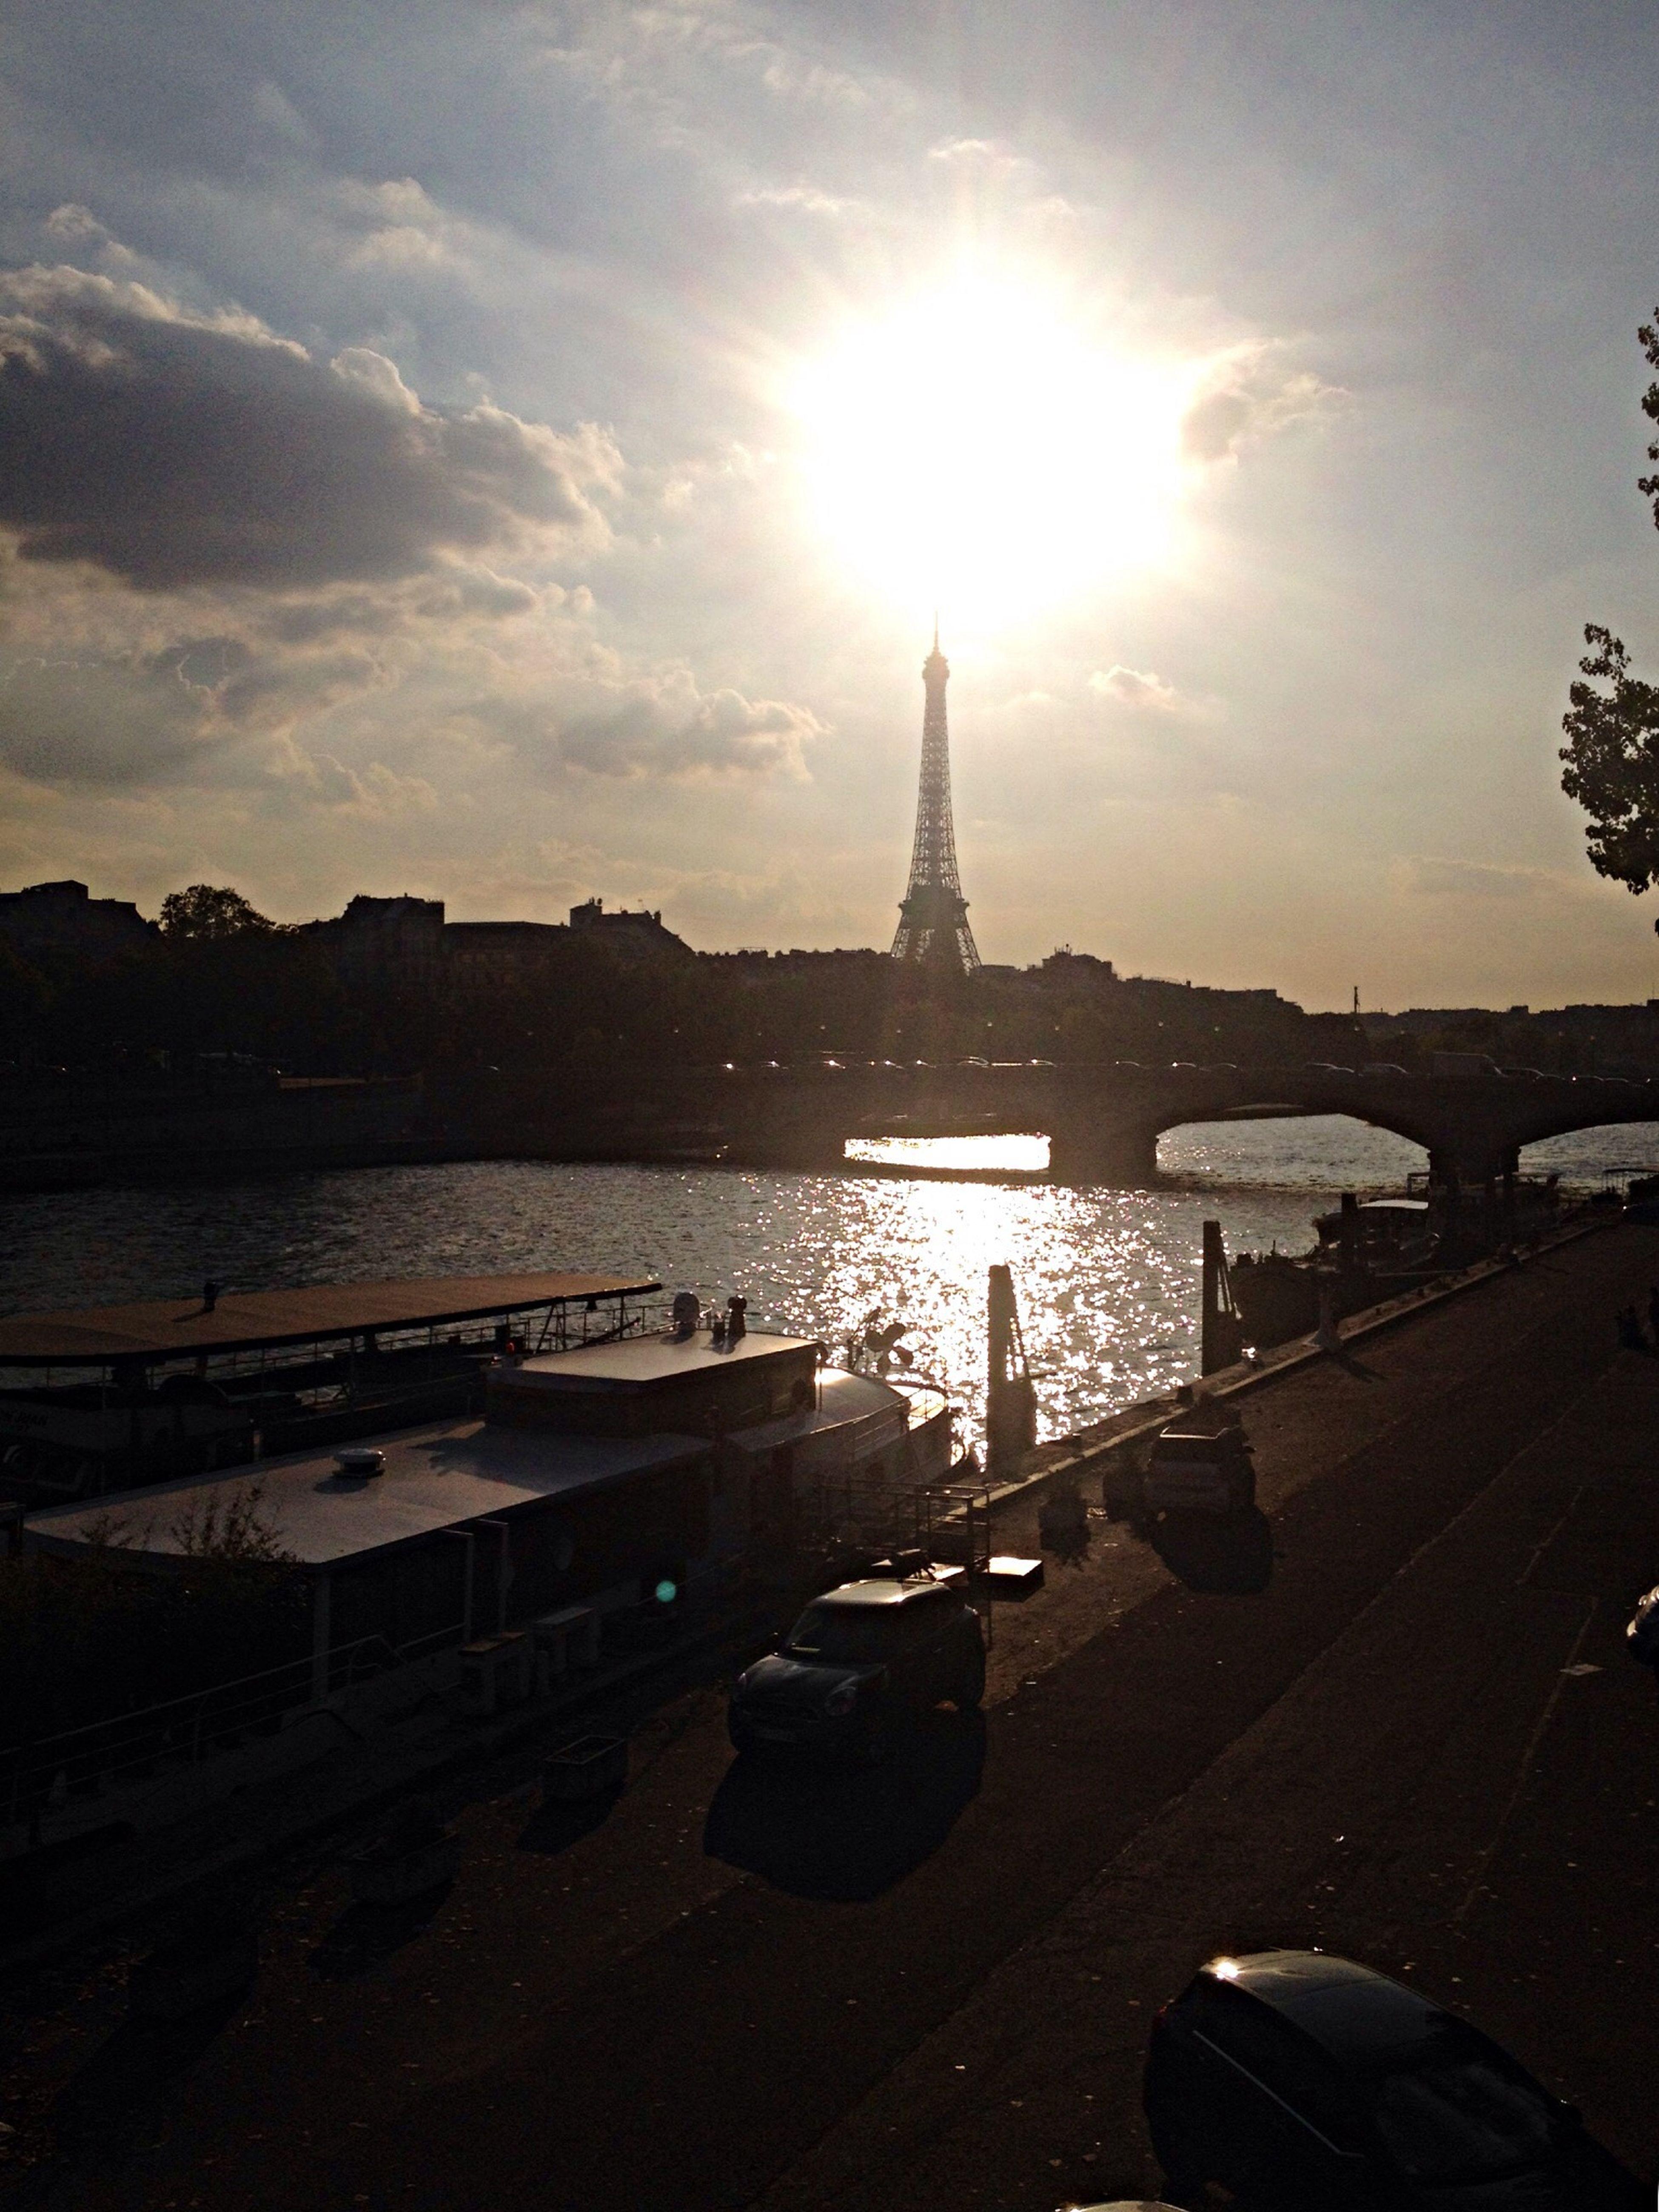 Tour Eiffel Automne Lovely Paris Fall Seine Sunset